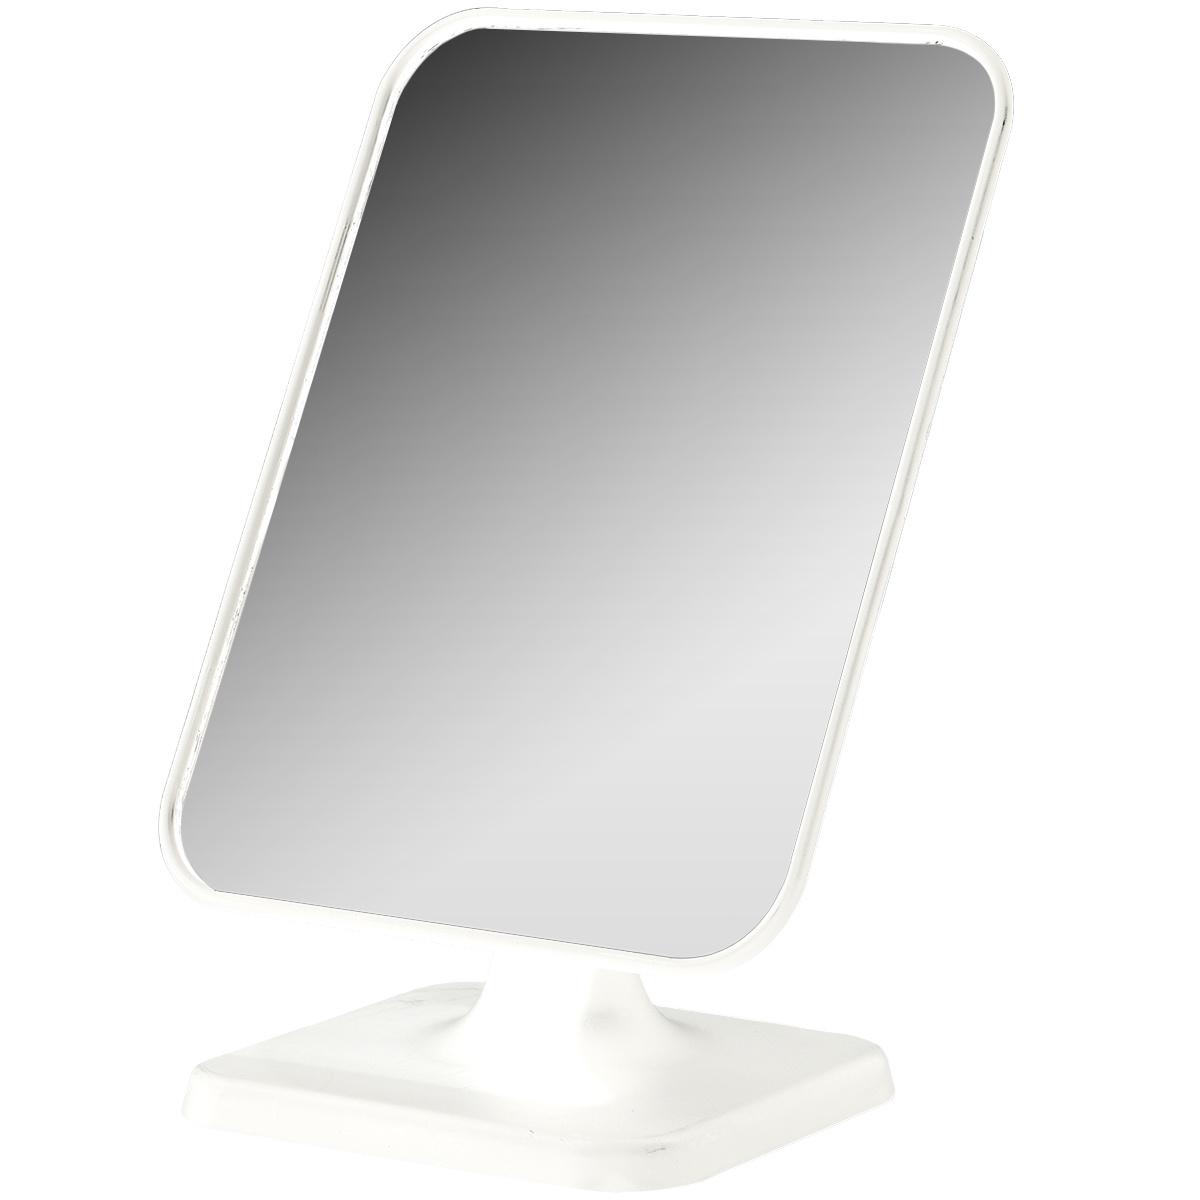 Kosmetické zrcadlo Compact Mirror bílá, 21,5 x 15 cm